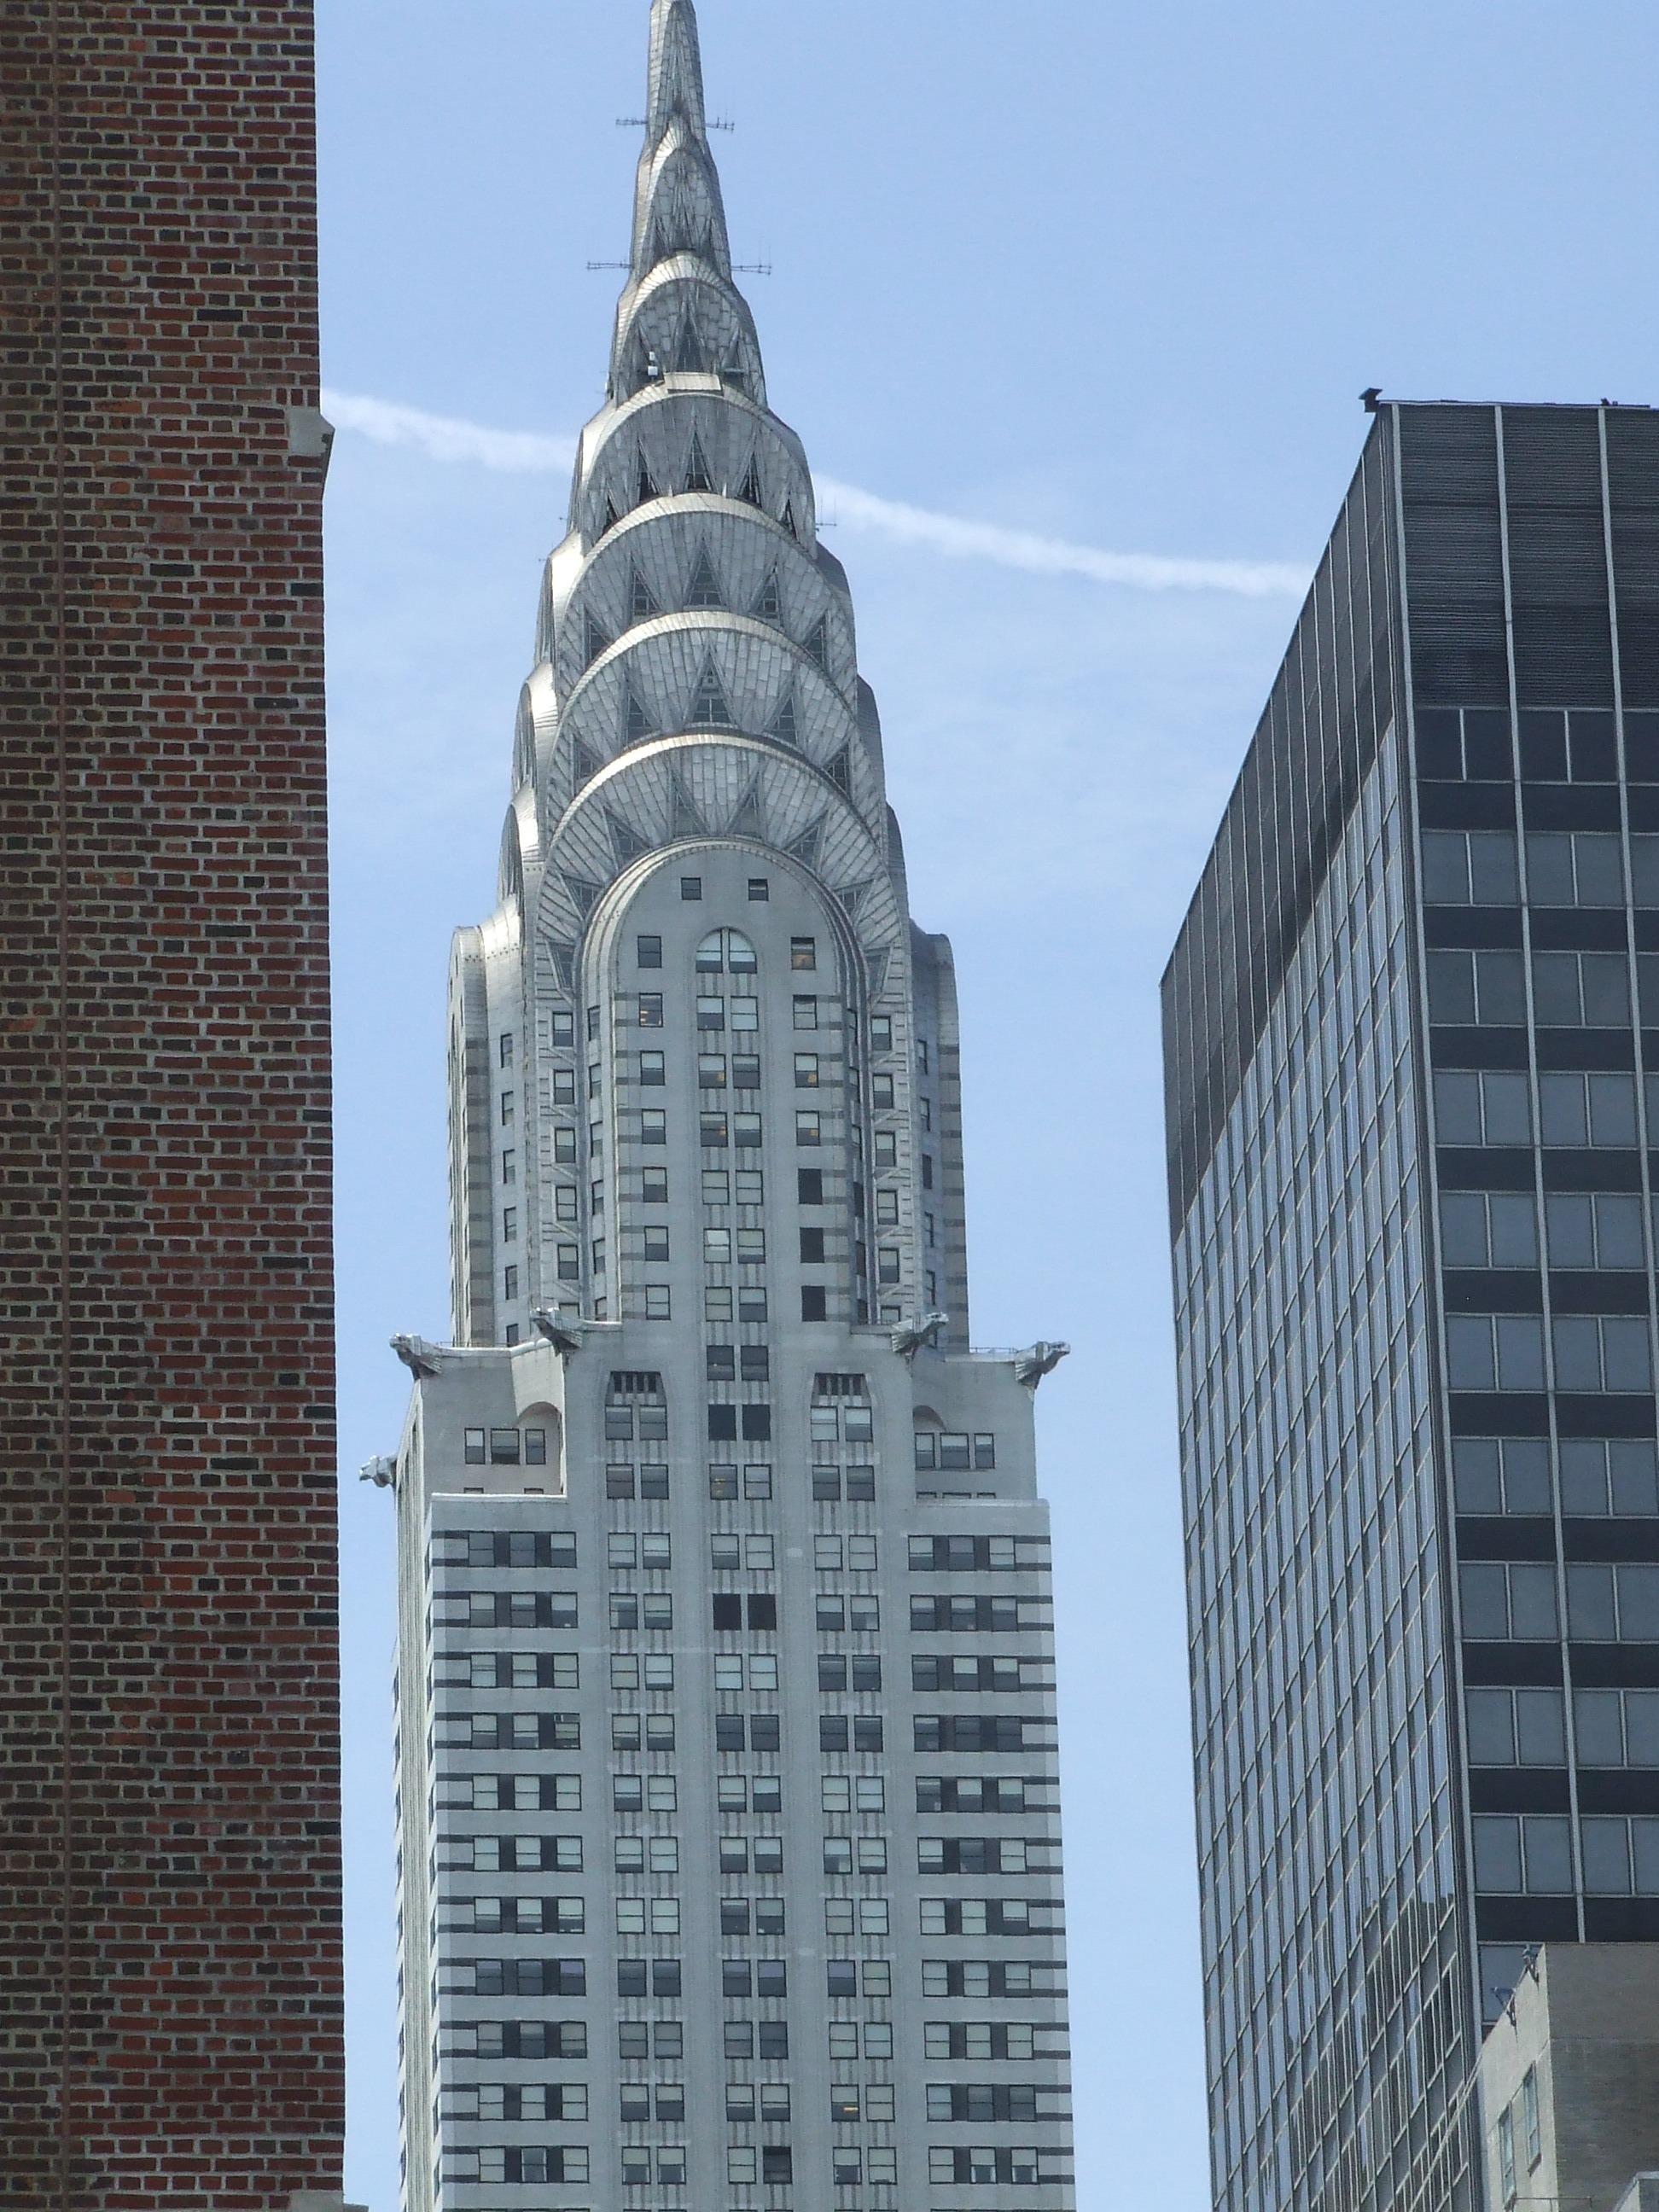 0358New_York_City_Chrysler_Building